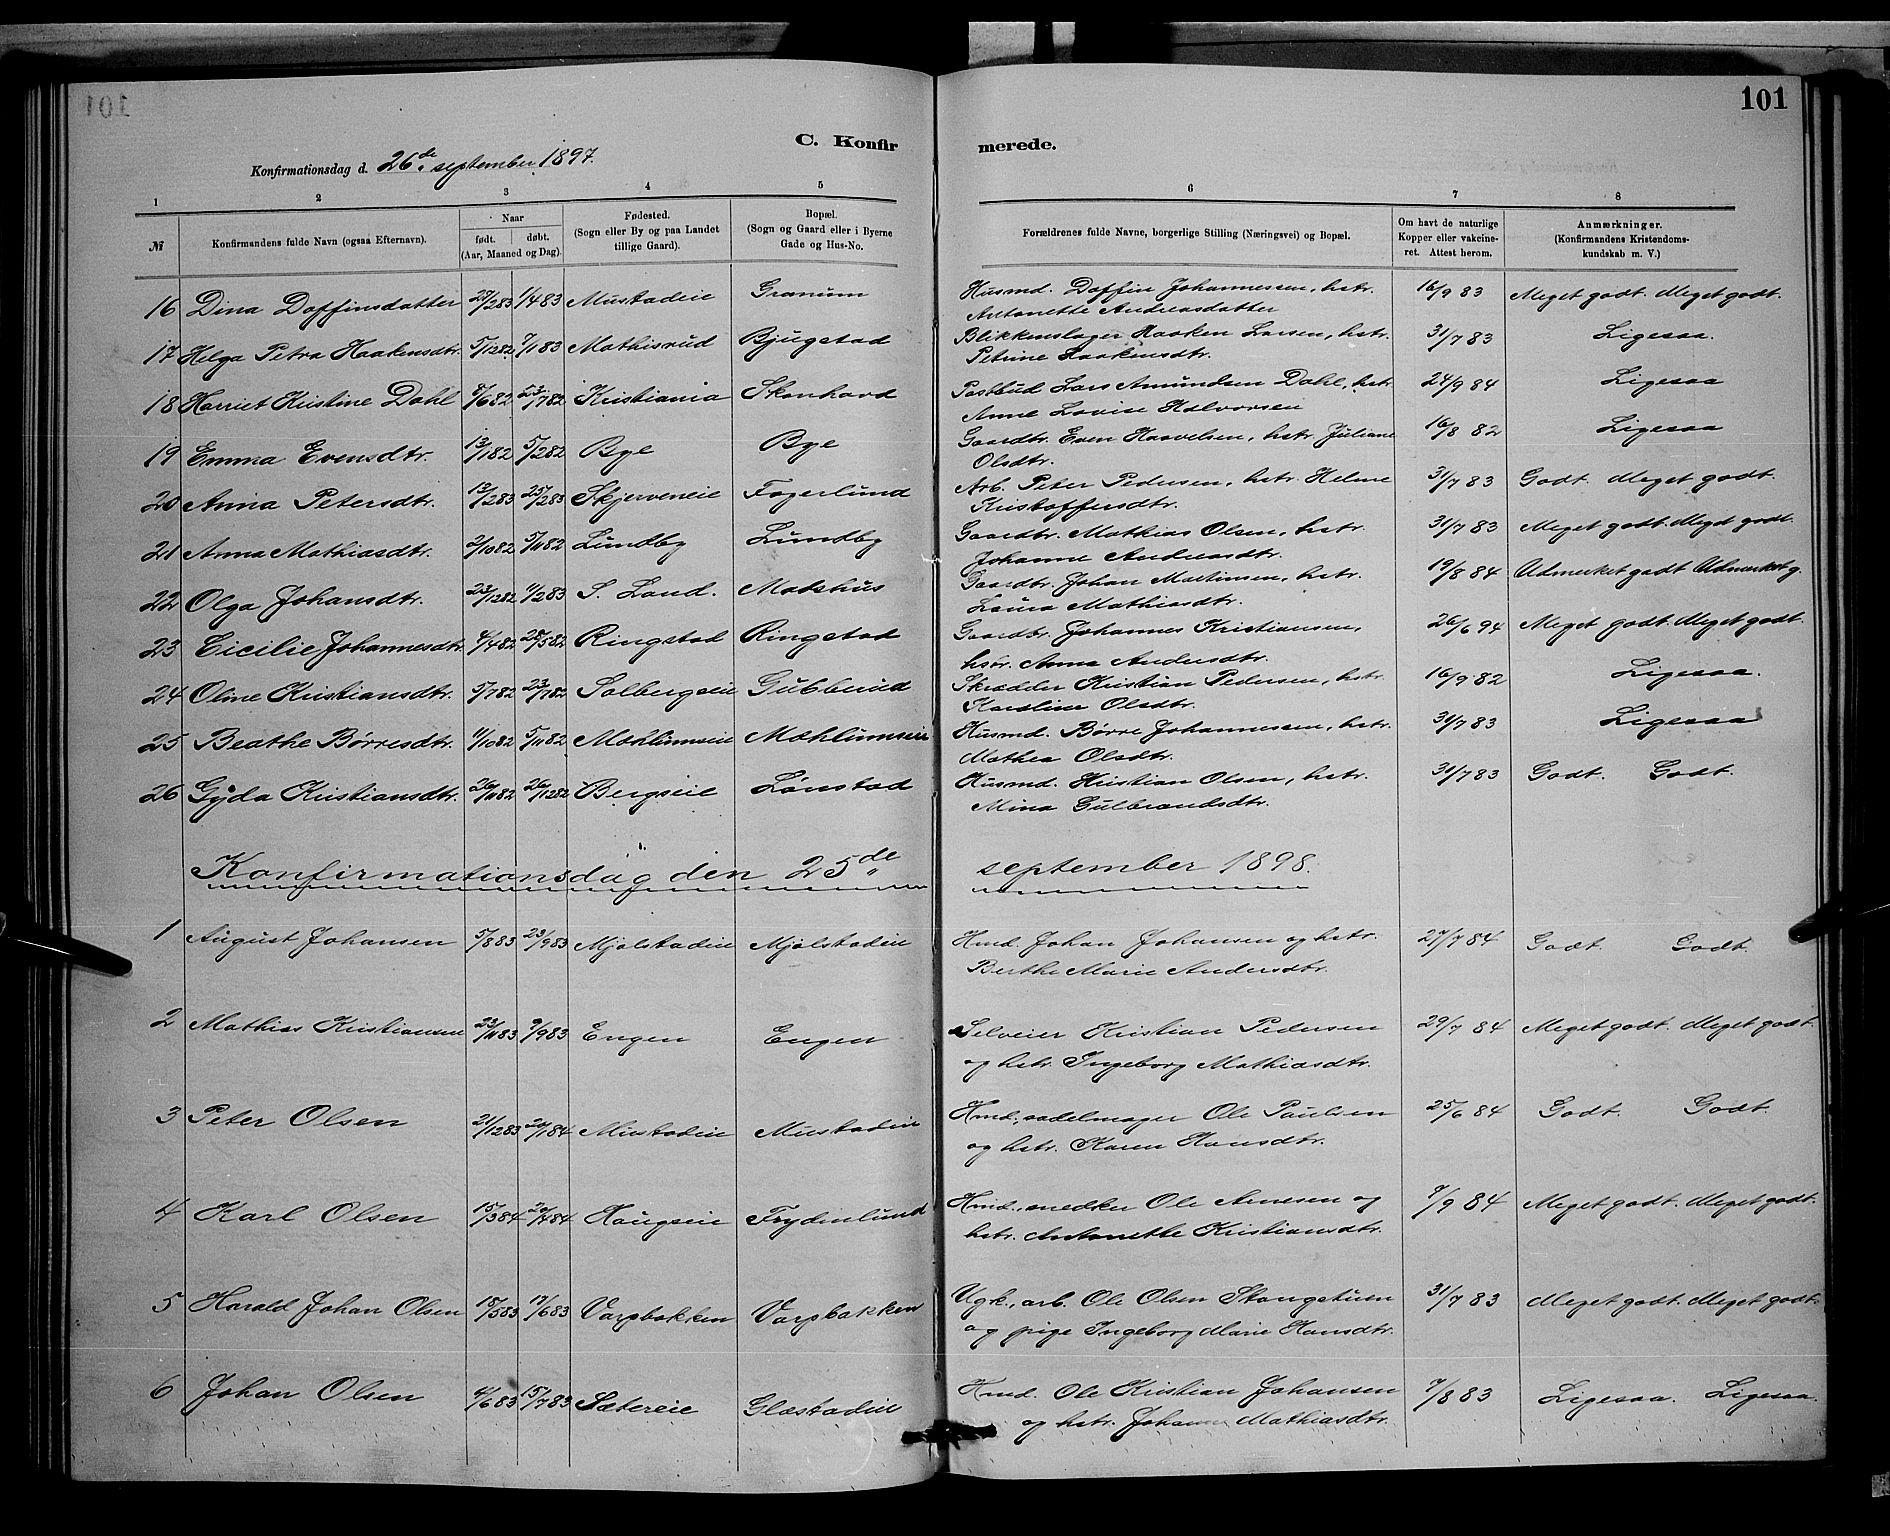 SAH, Vardal prestekontor, H/Ha/Hab/L0008: Klokkerbok nr. 8, 1881-1898, s. 101